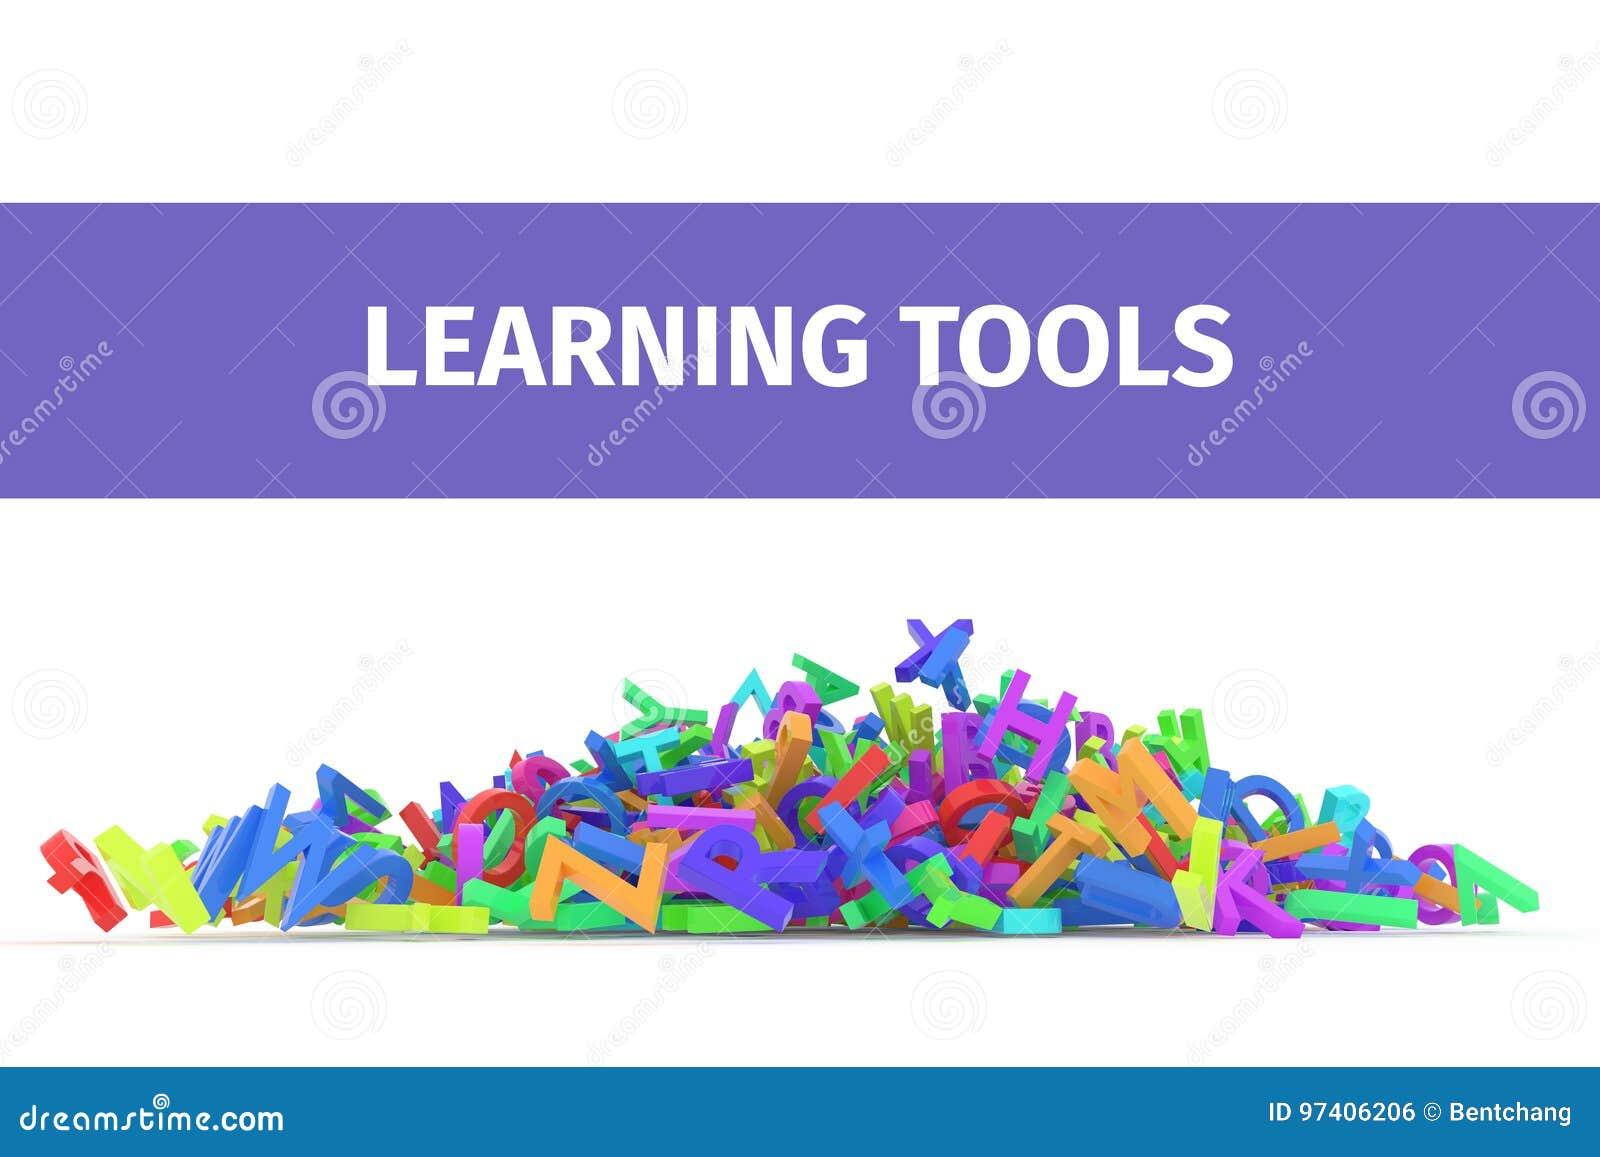 Download Kindergarten Word Cloud Stack Of Alphabets Stock Illustration